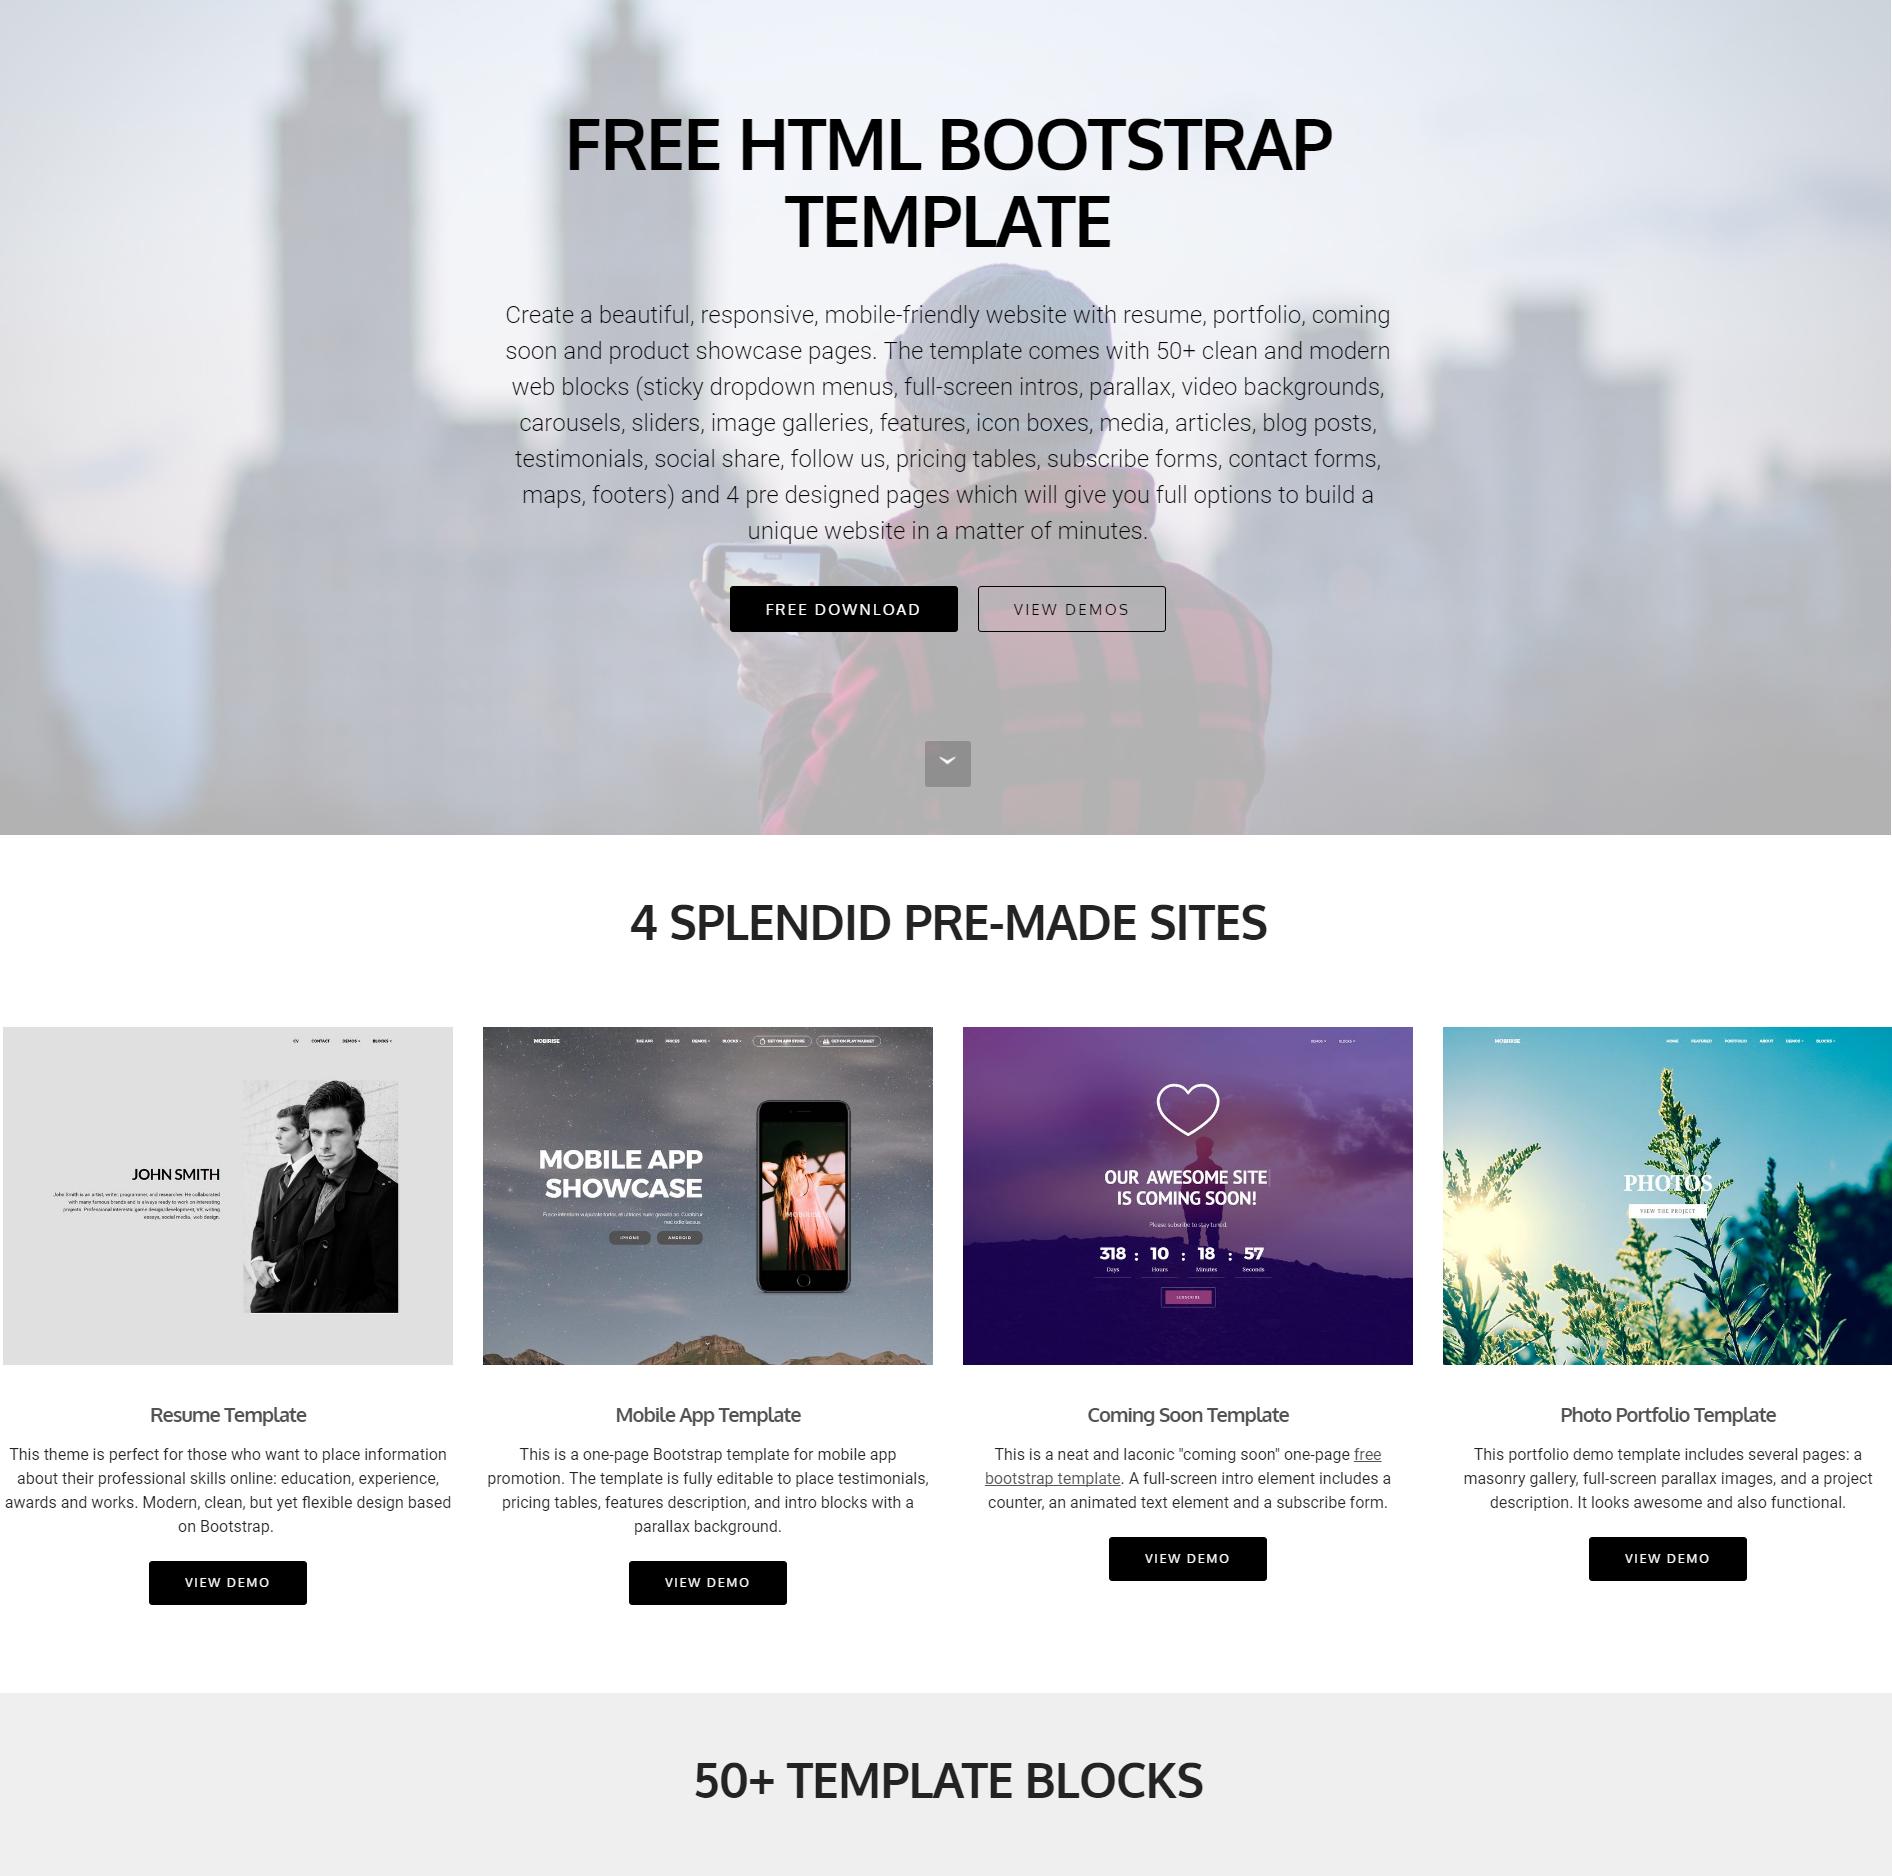 Responsive Bootstrap 4 Blocks Templates